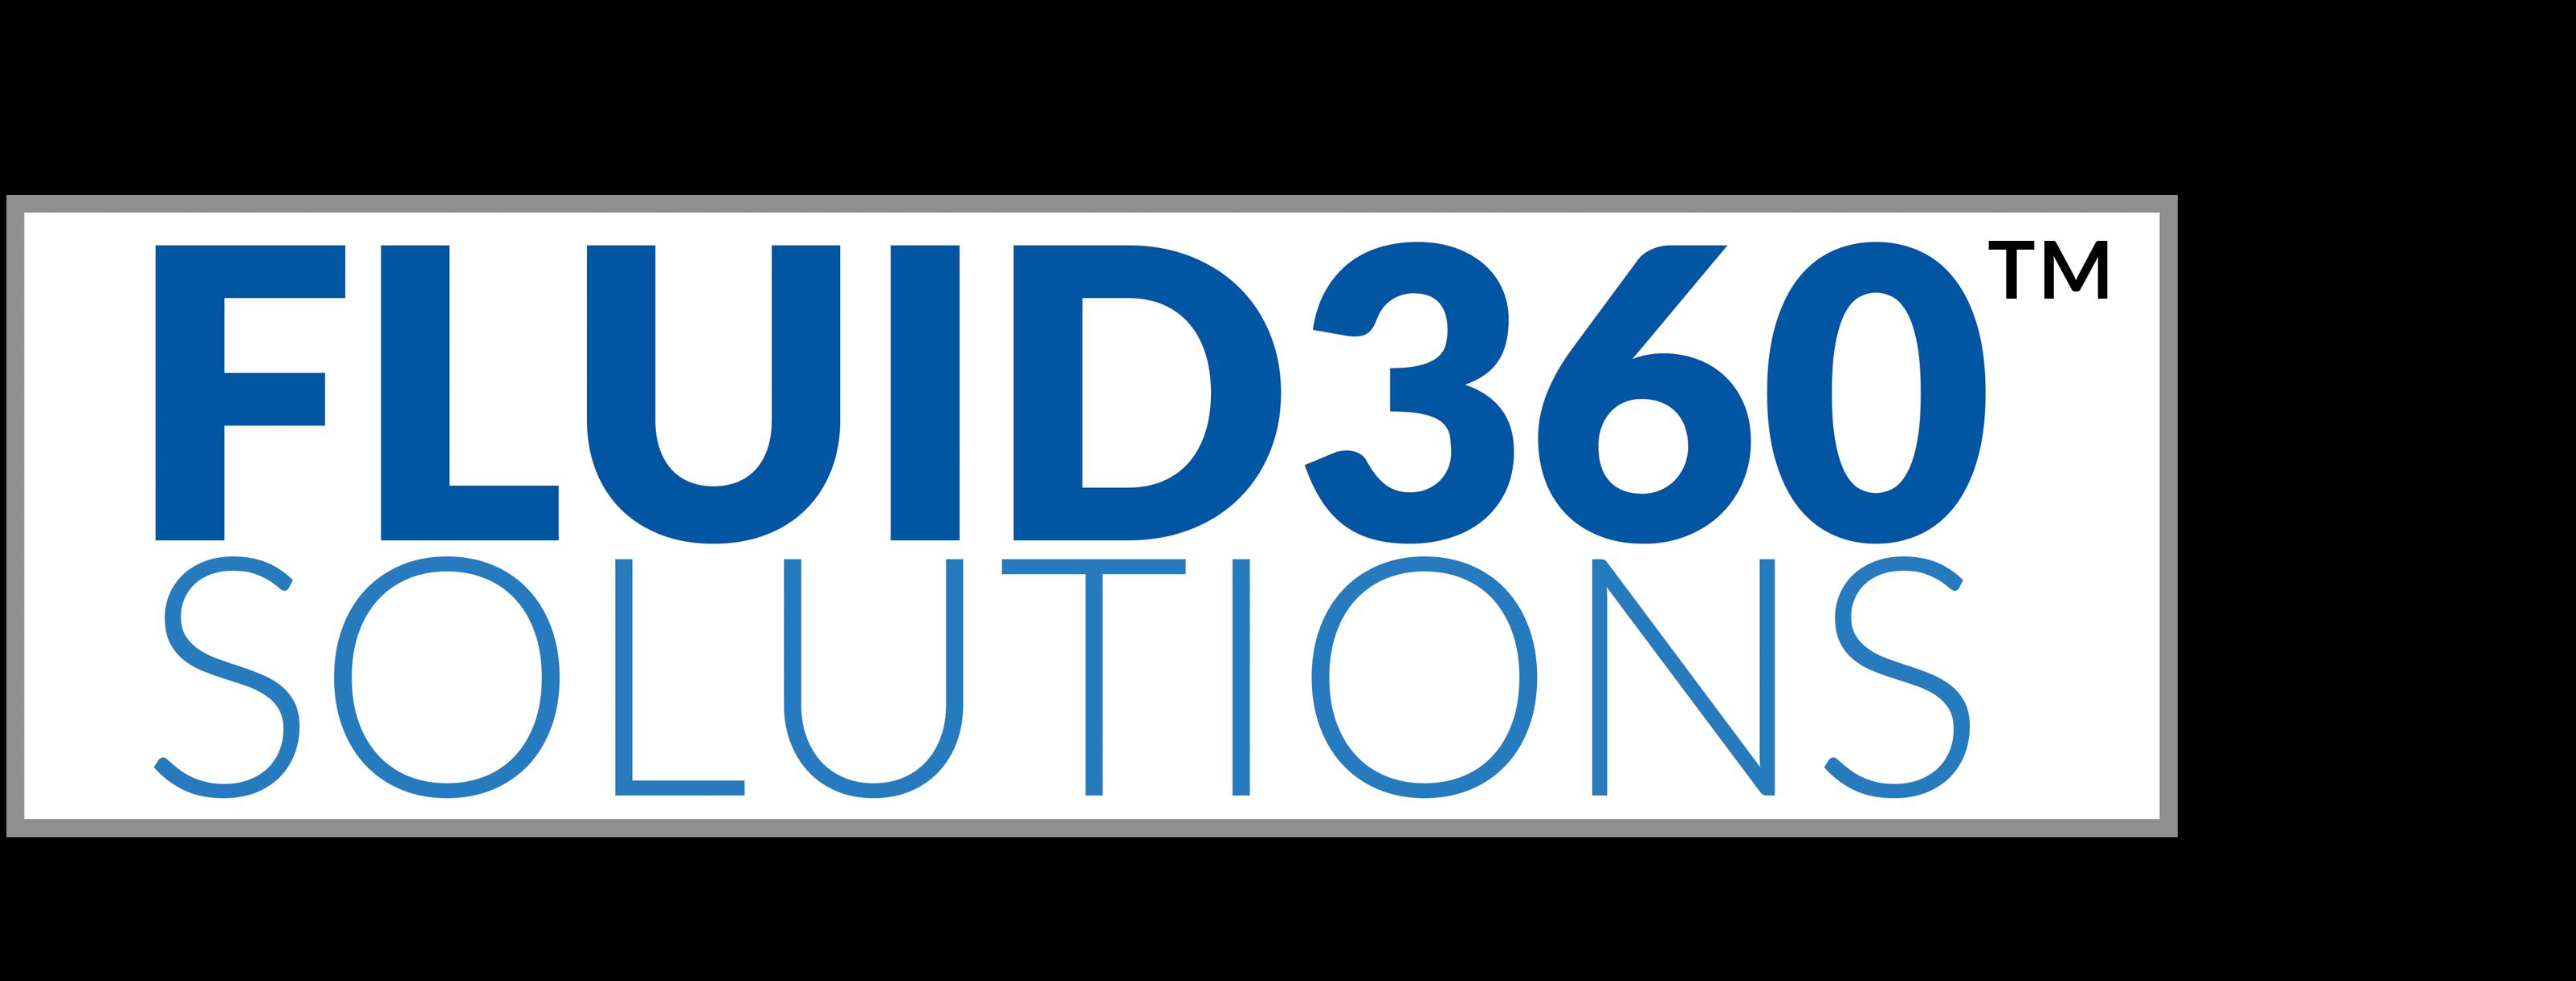 ASHBURN FLUID360 sOLUTIONS